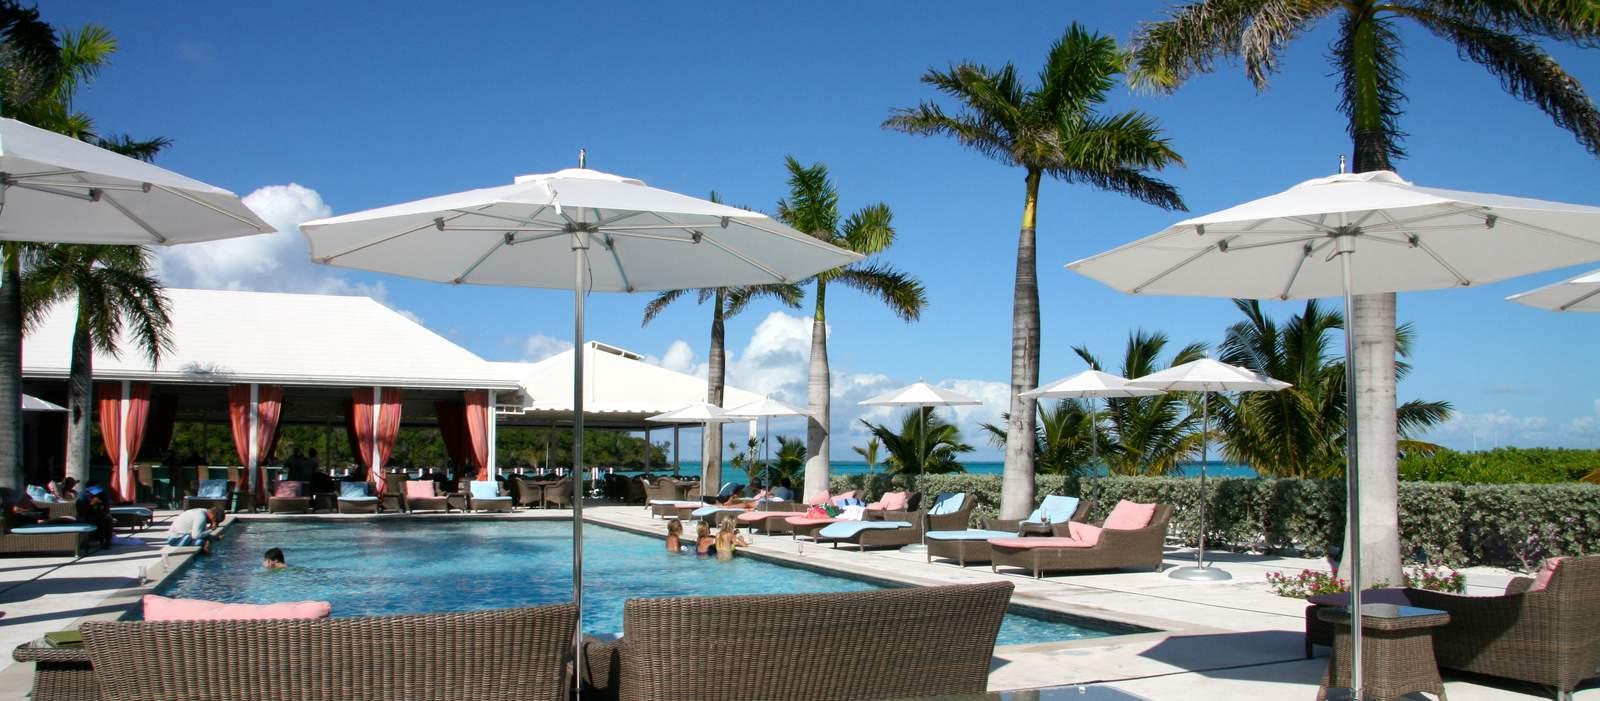 Treasure Sands Club auf Abaco, Bahamas